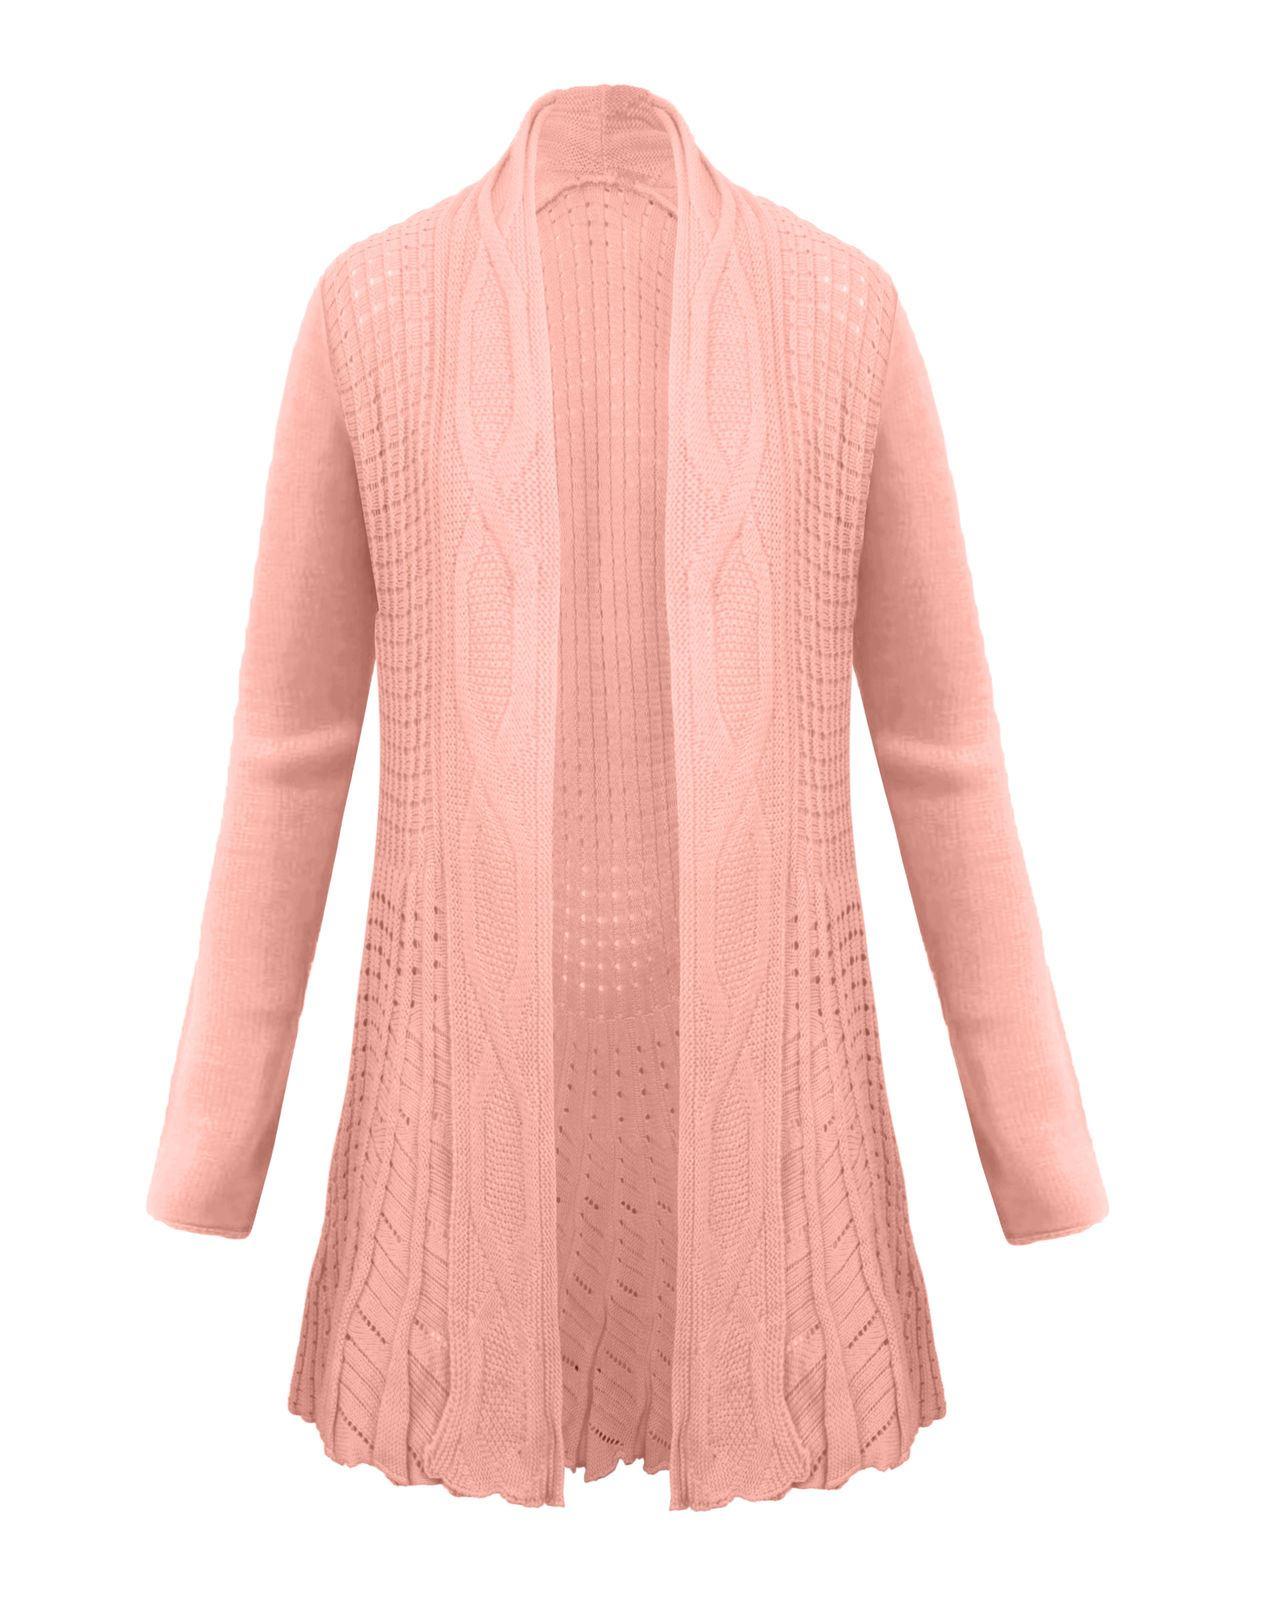 Knitting Cardigan For Ladies : New ladies women knitted boyfriend waterfall cardigan top